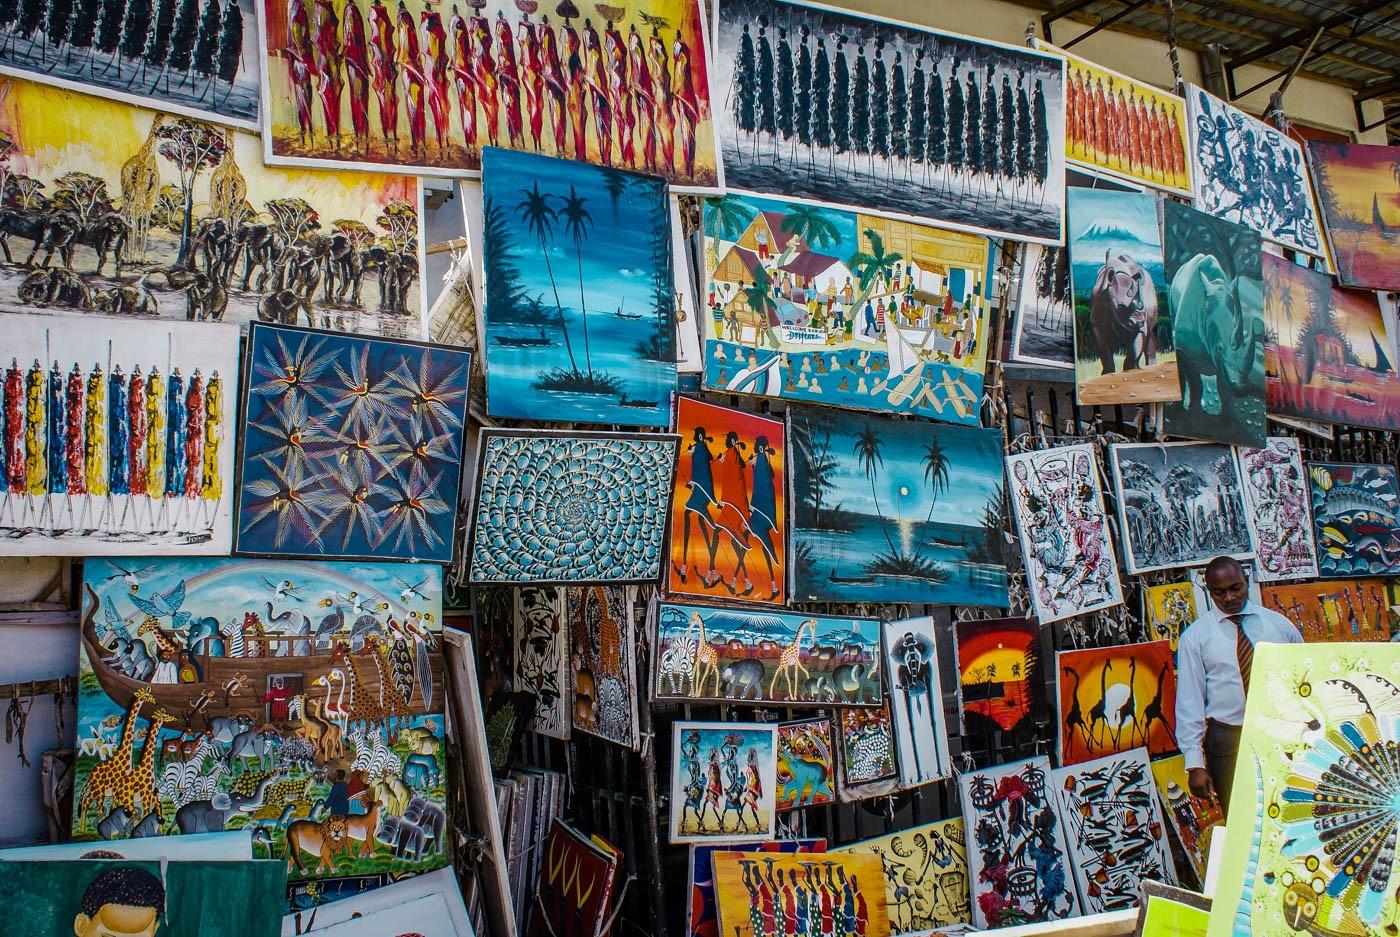 Art shopping in Dar Es Salaam - Tanzania and Zanzibar - an exotic adventure. Beaches I Stone Town I Africa Travel I Dar Es Salaam #traveldestinations #traveltheworld #tanzania